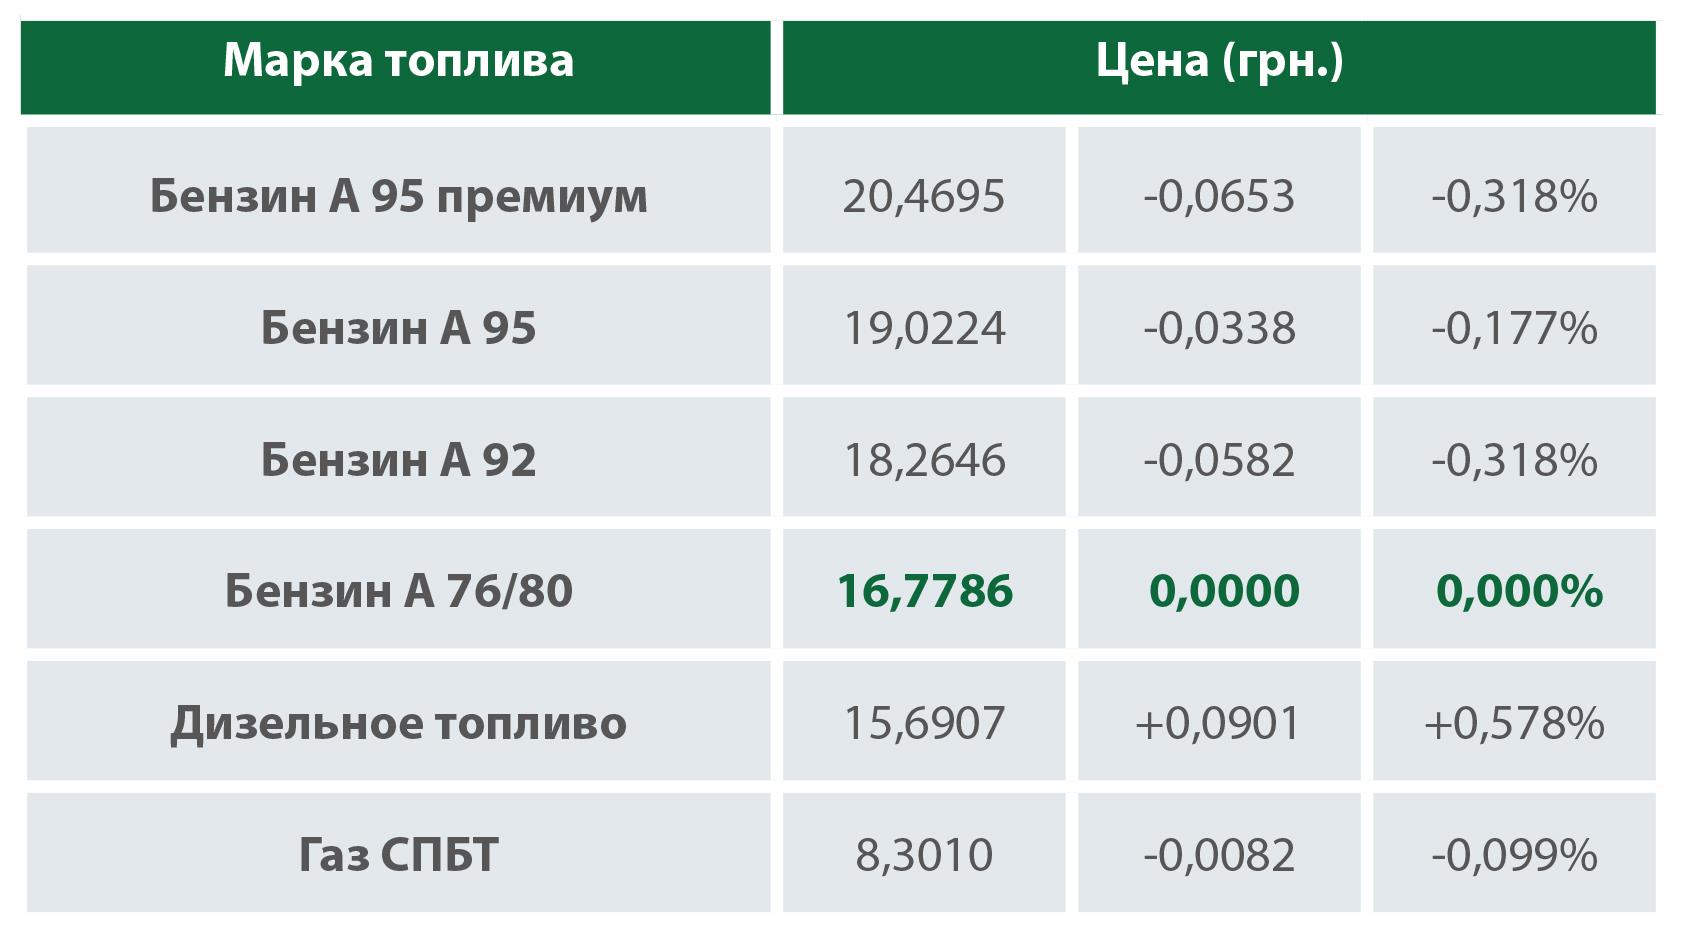 Tabliza-5-1-24-0